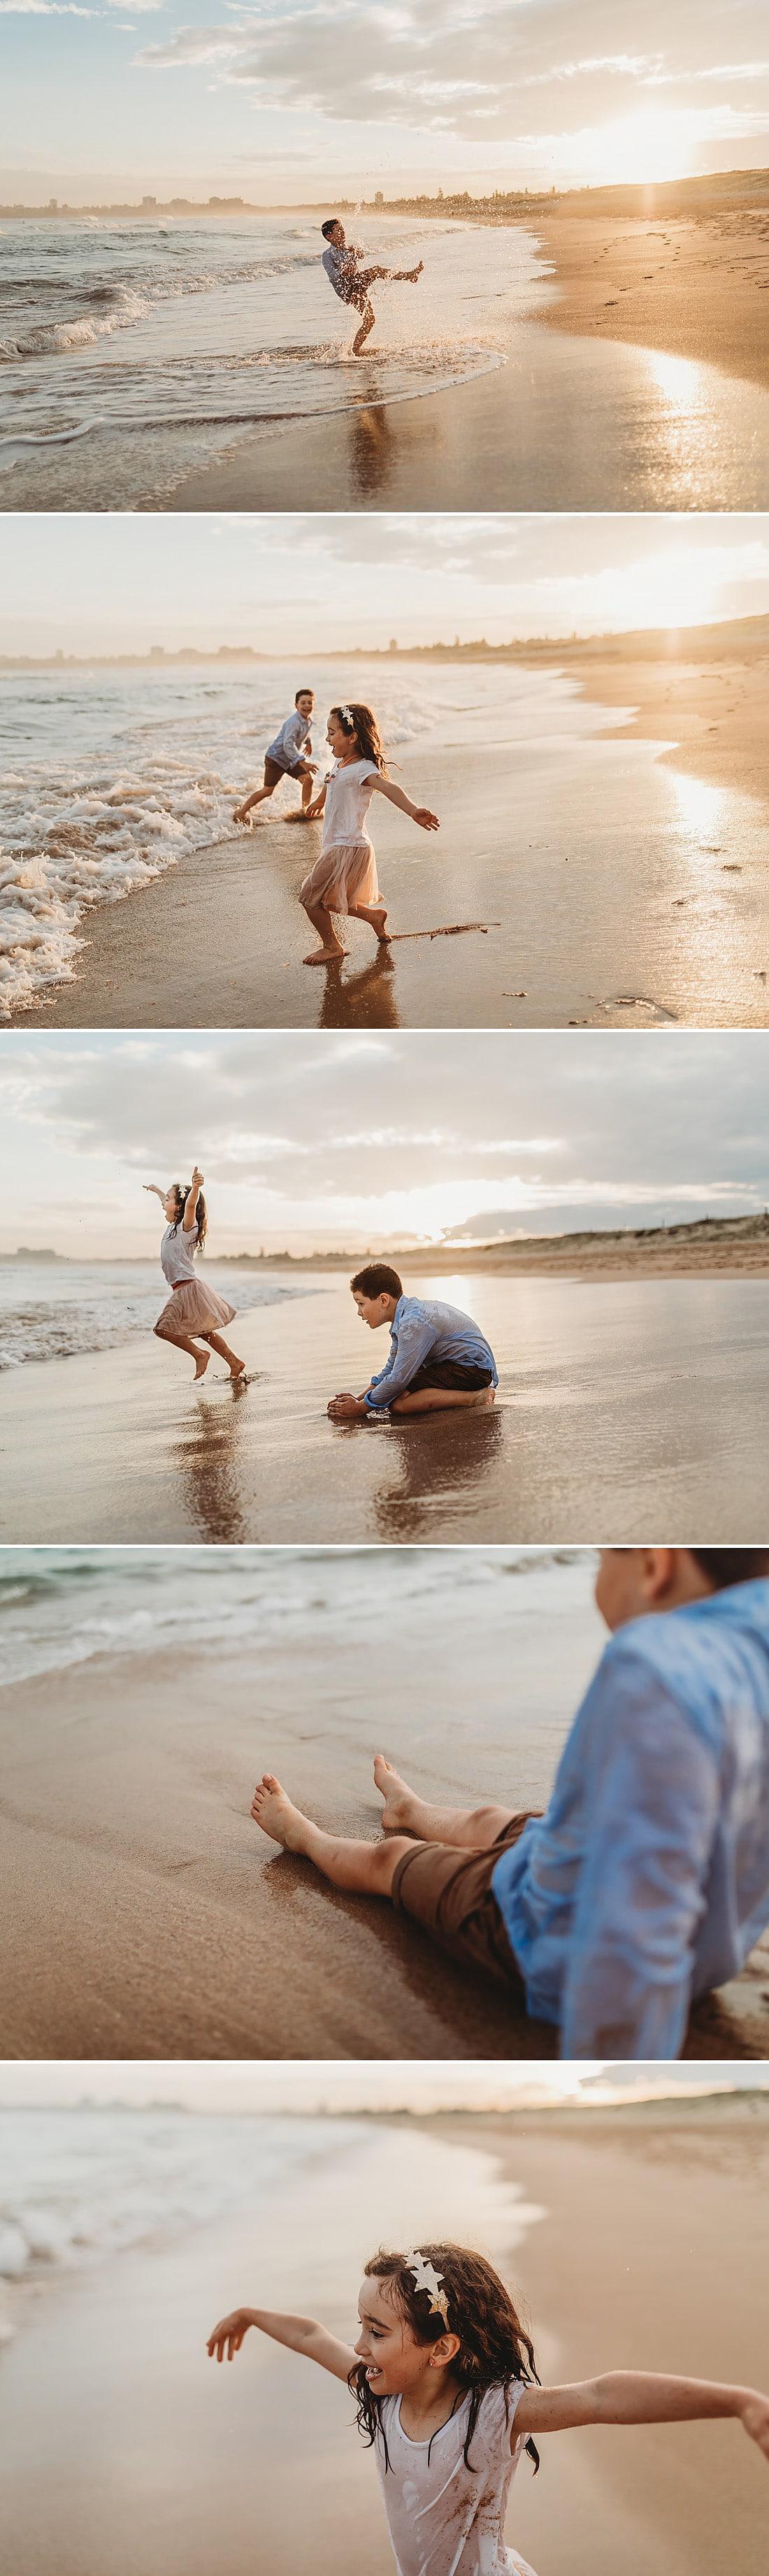 Sydney-family-photography-lifestyle-beach-session